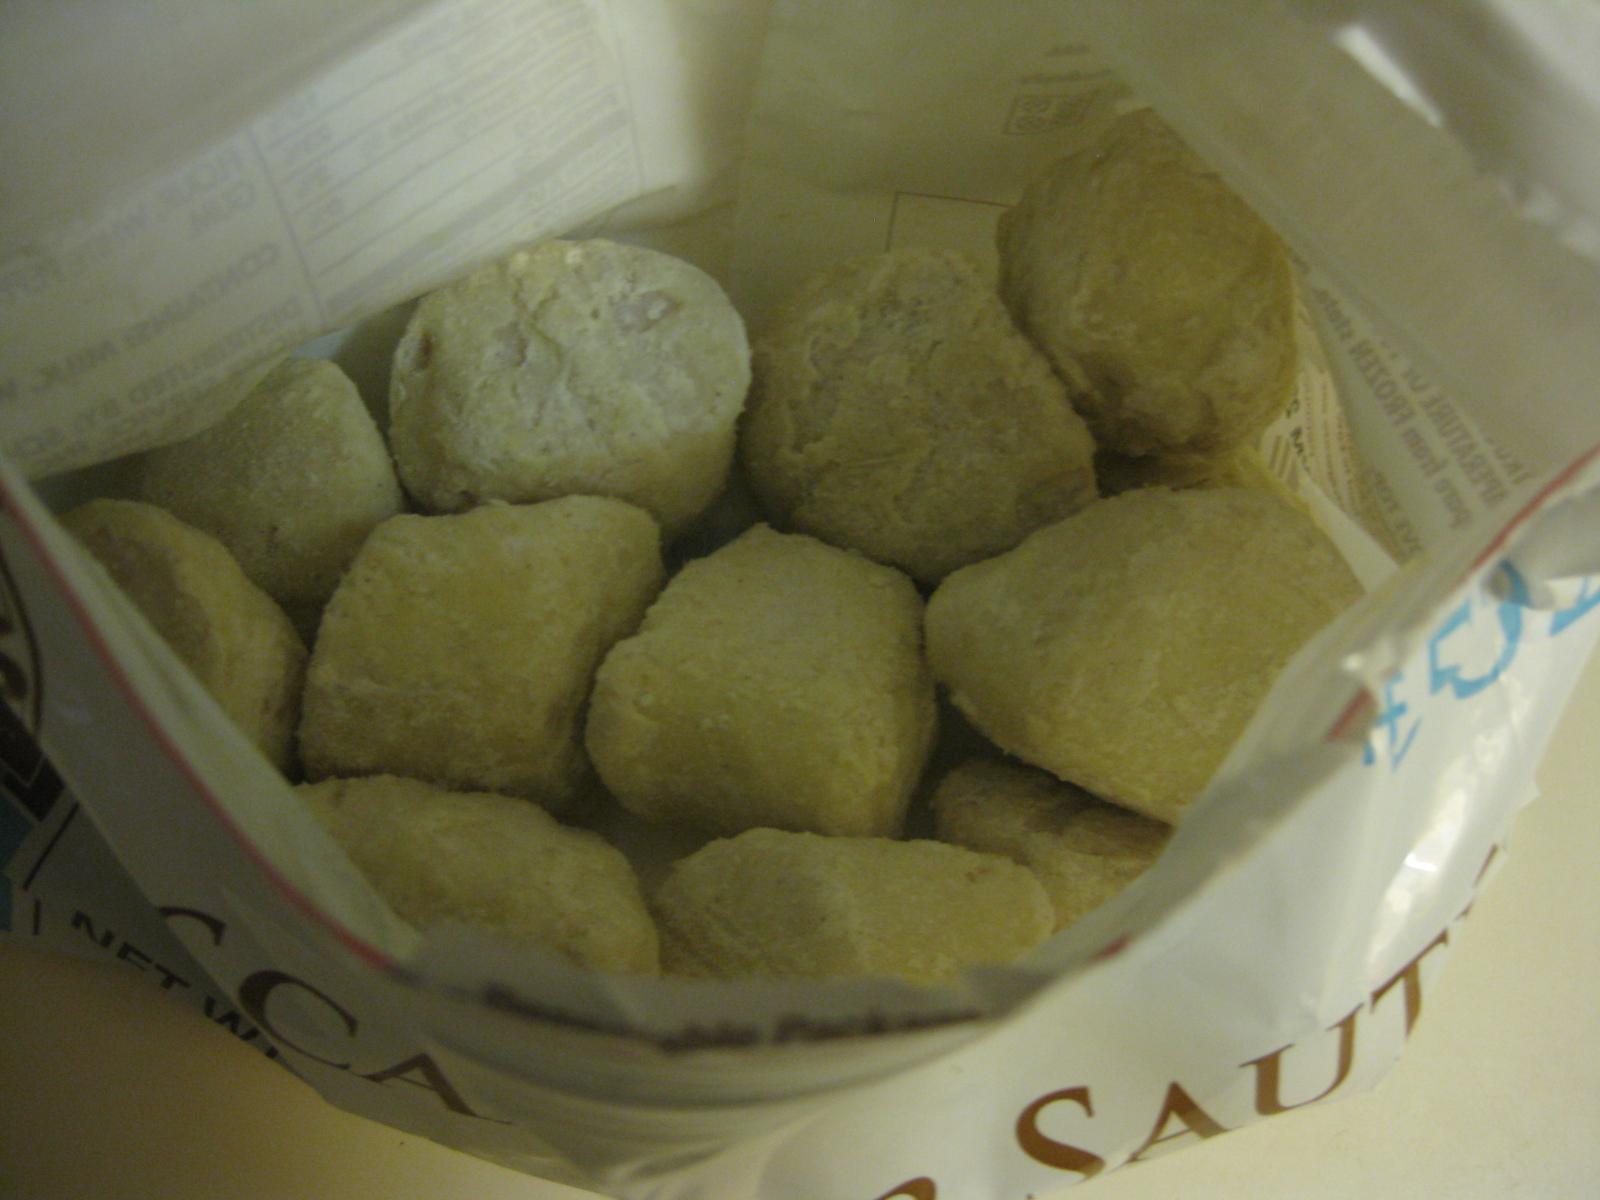 Schwan's Scallop Saute Frozen